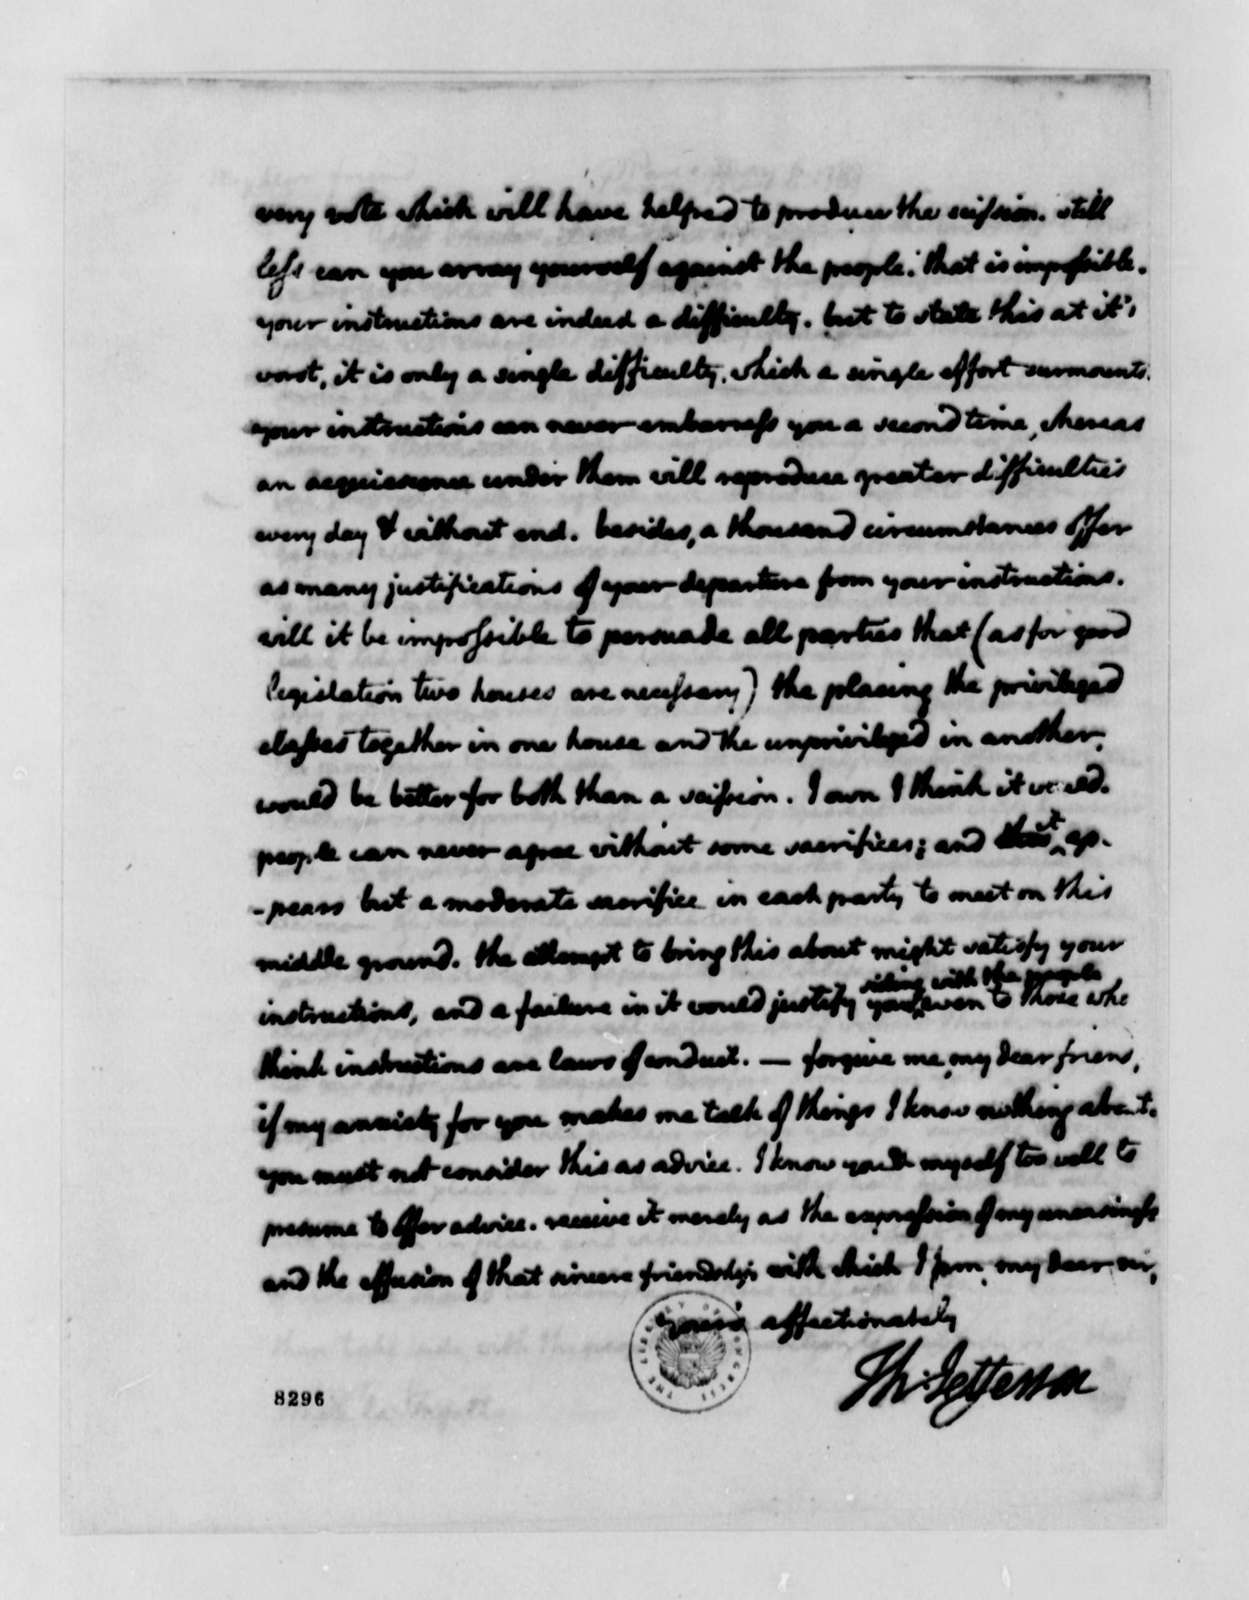 Thomas Jefferson to Marie Joseph Paul Yves Roch Gilbert du Motier, Marquis de Lafayette, May 6, 1789